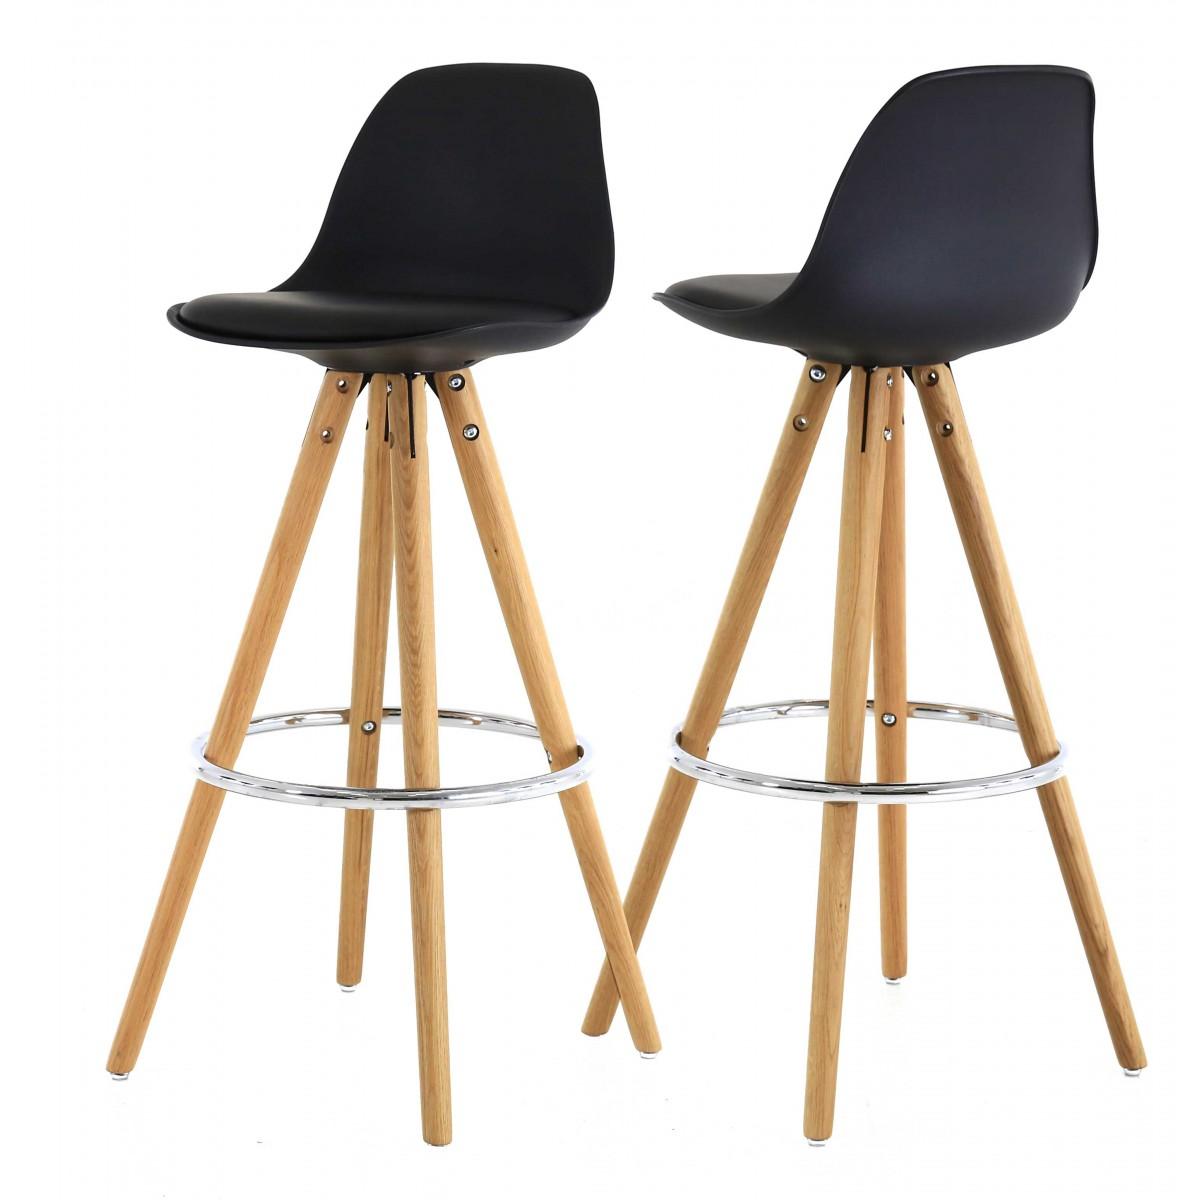 tabouret de bar en bois brut mobilier design d coration d 39 int rieur. Black Bedroom Furniture Sets. Home Design Ideas